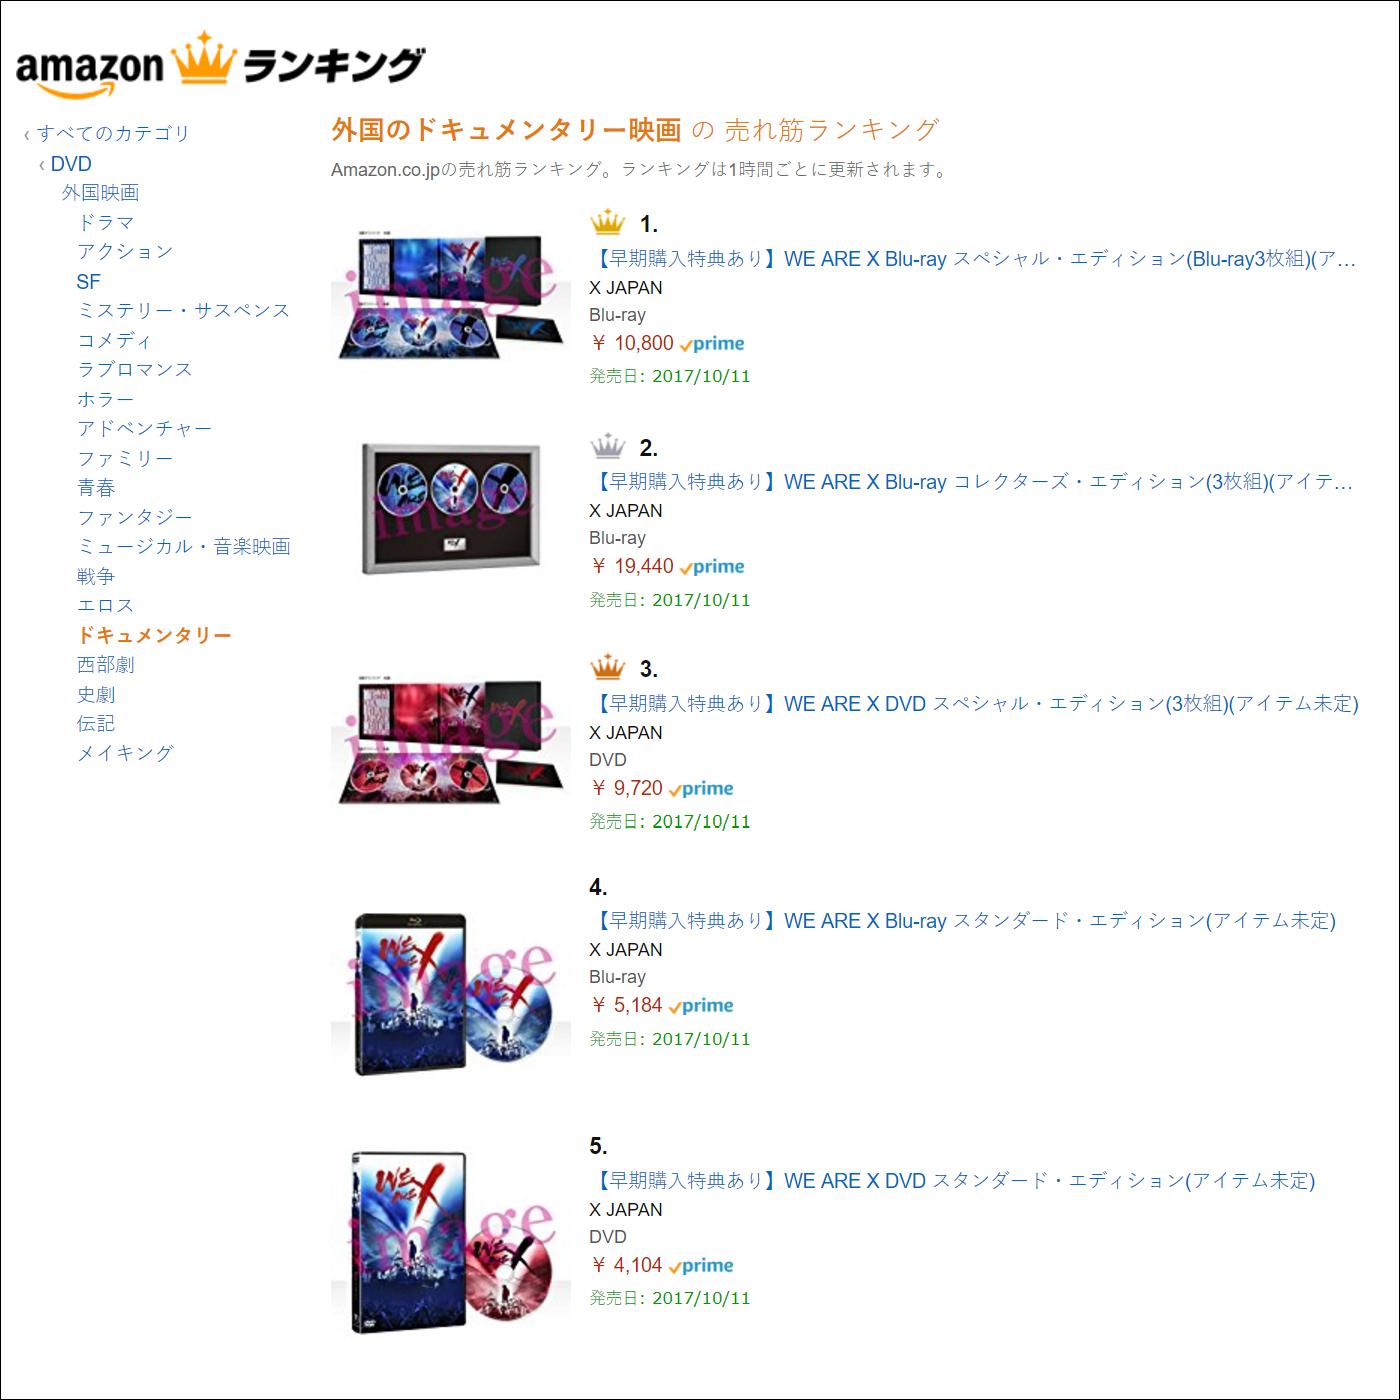 JRock247-We-Are-X-Japan-Blu-Ray-Amazon-Documentary-2017-07-11A